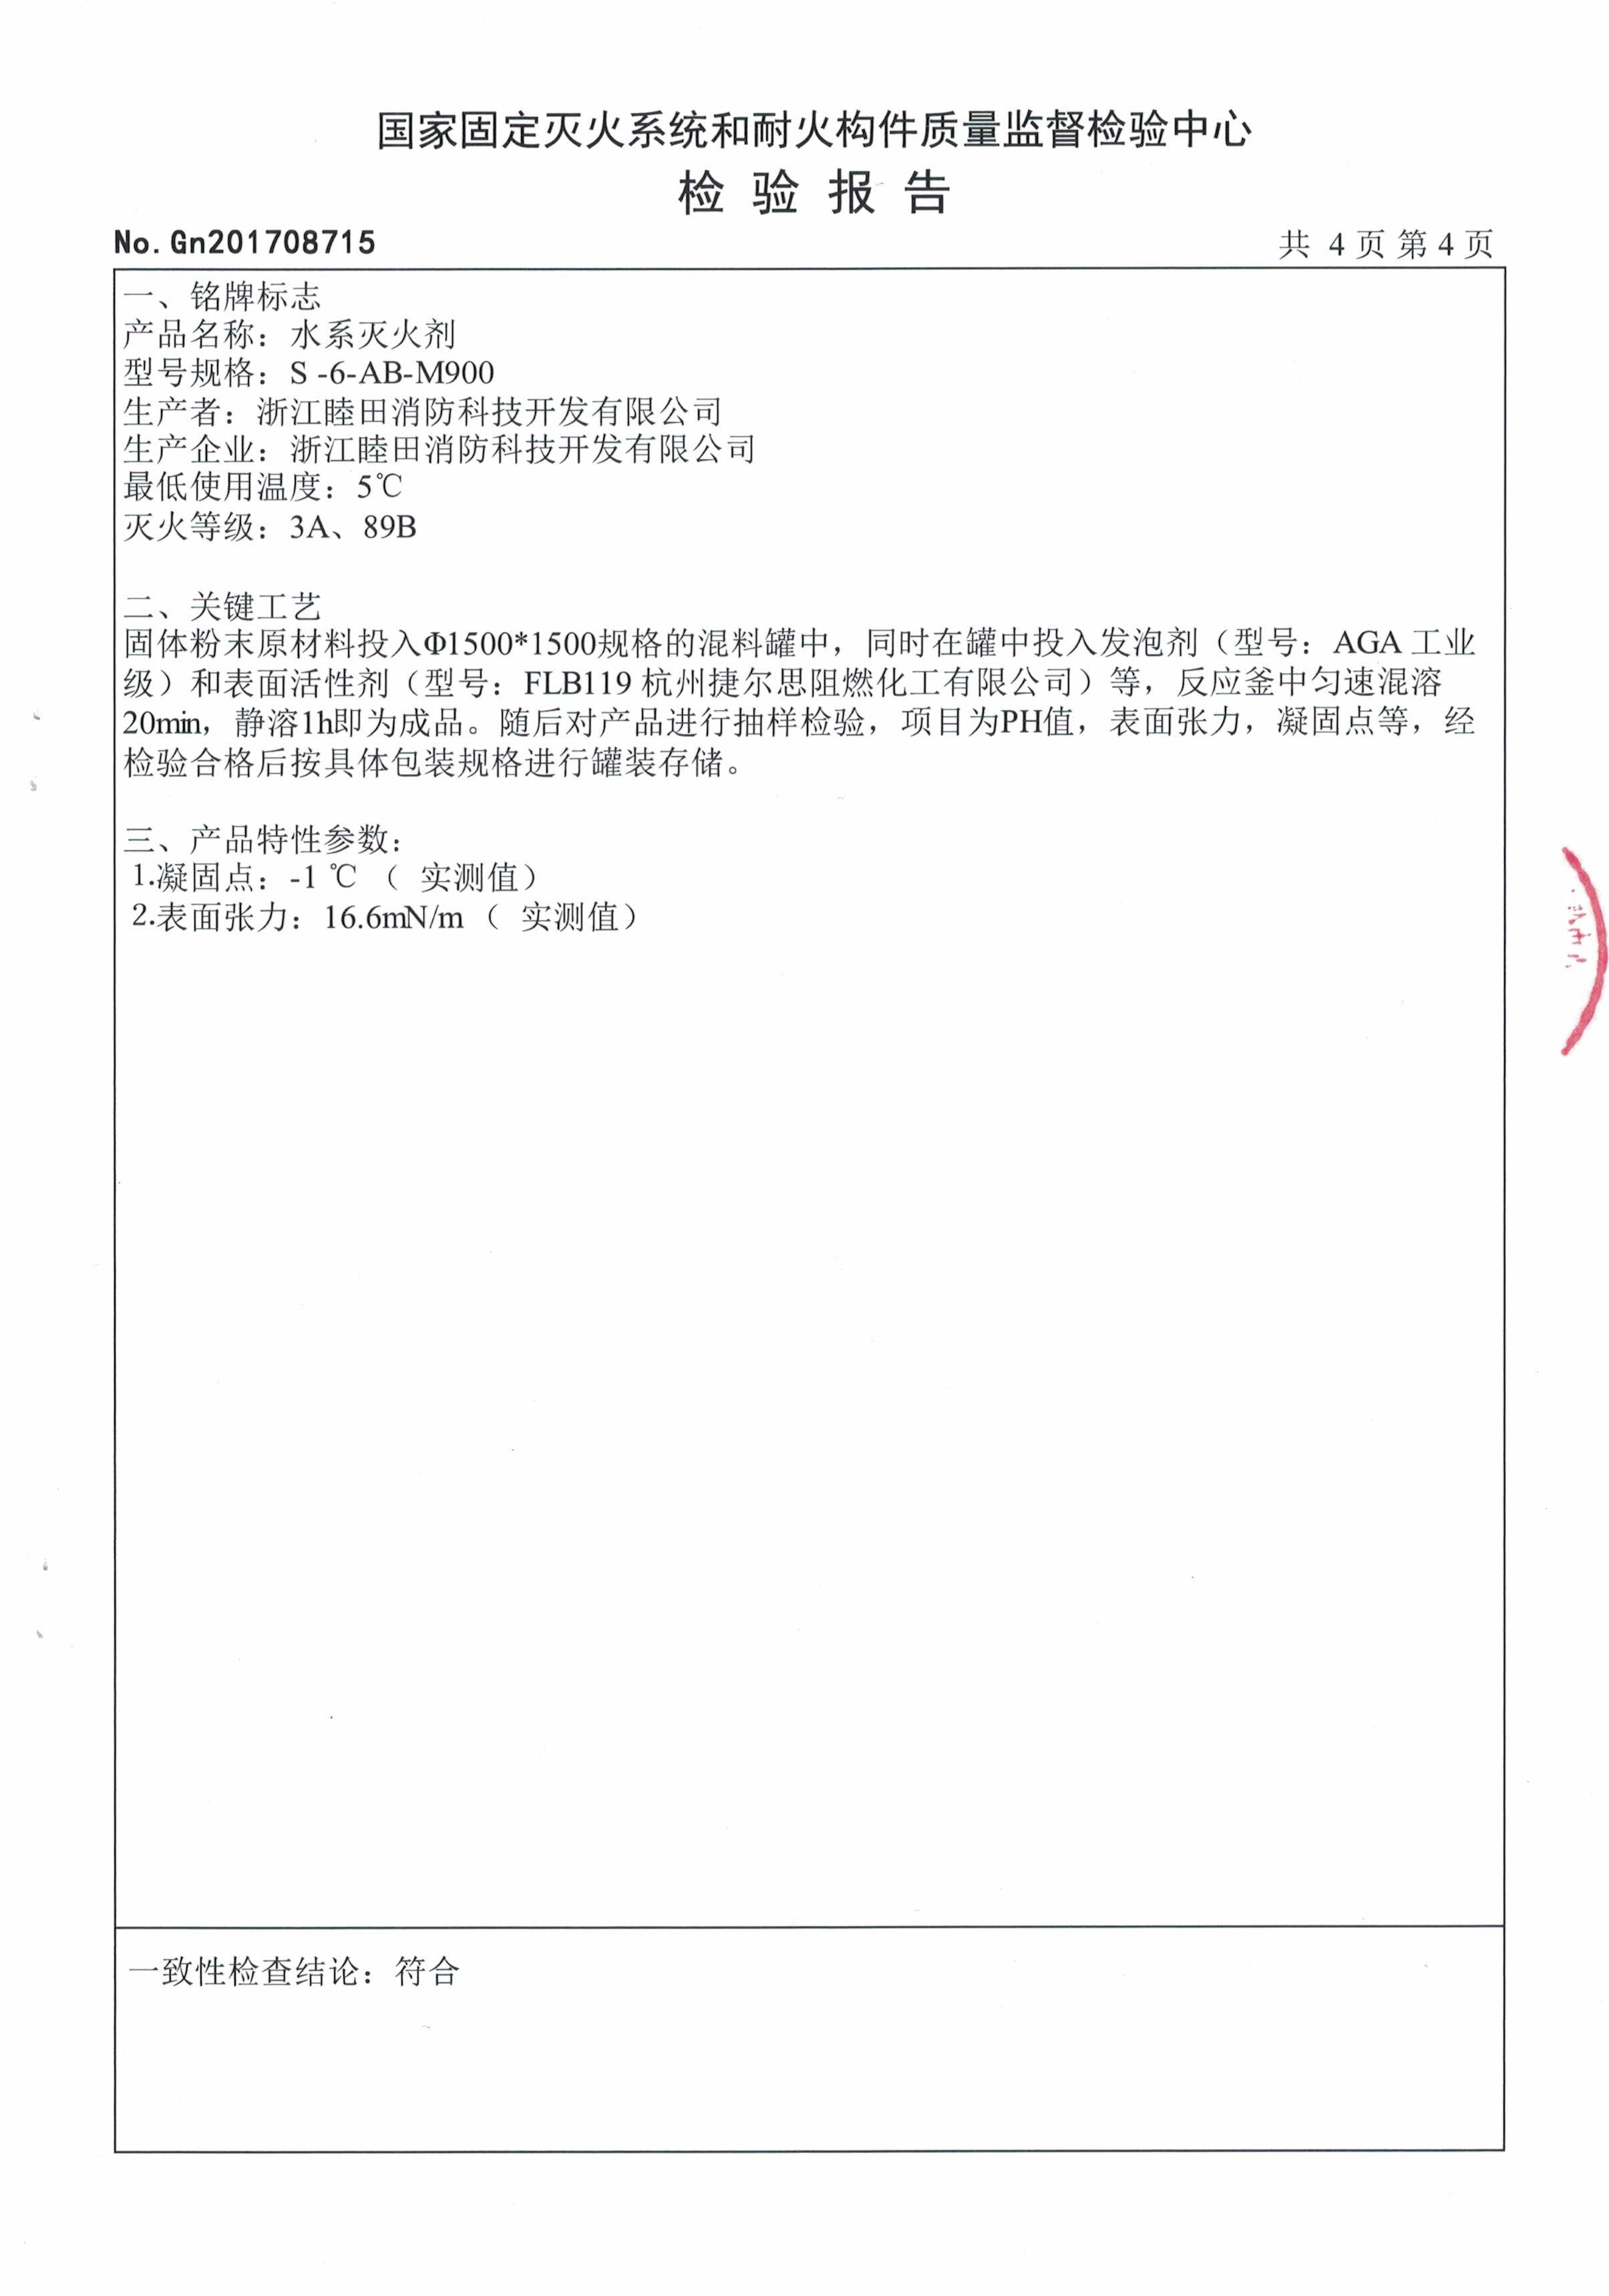 S-6-AB-M900检测报告_页面_5